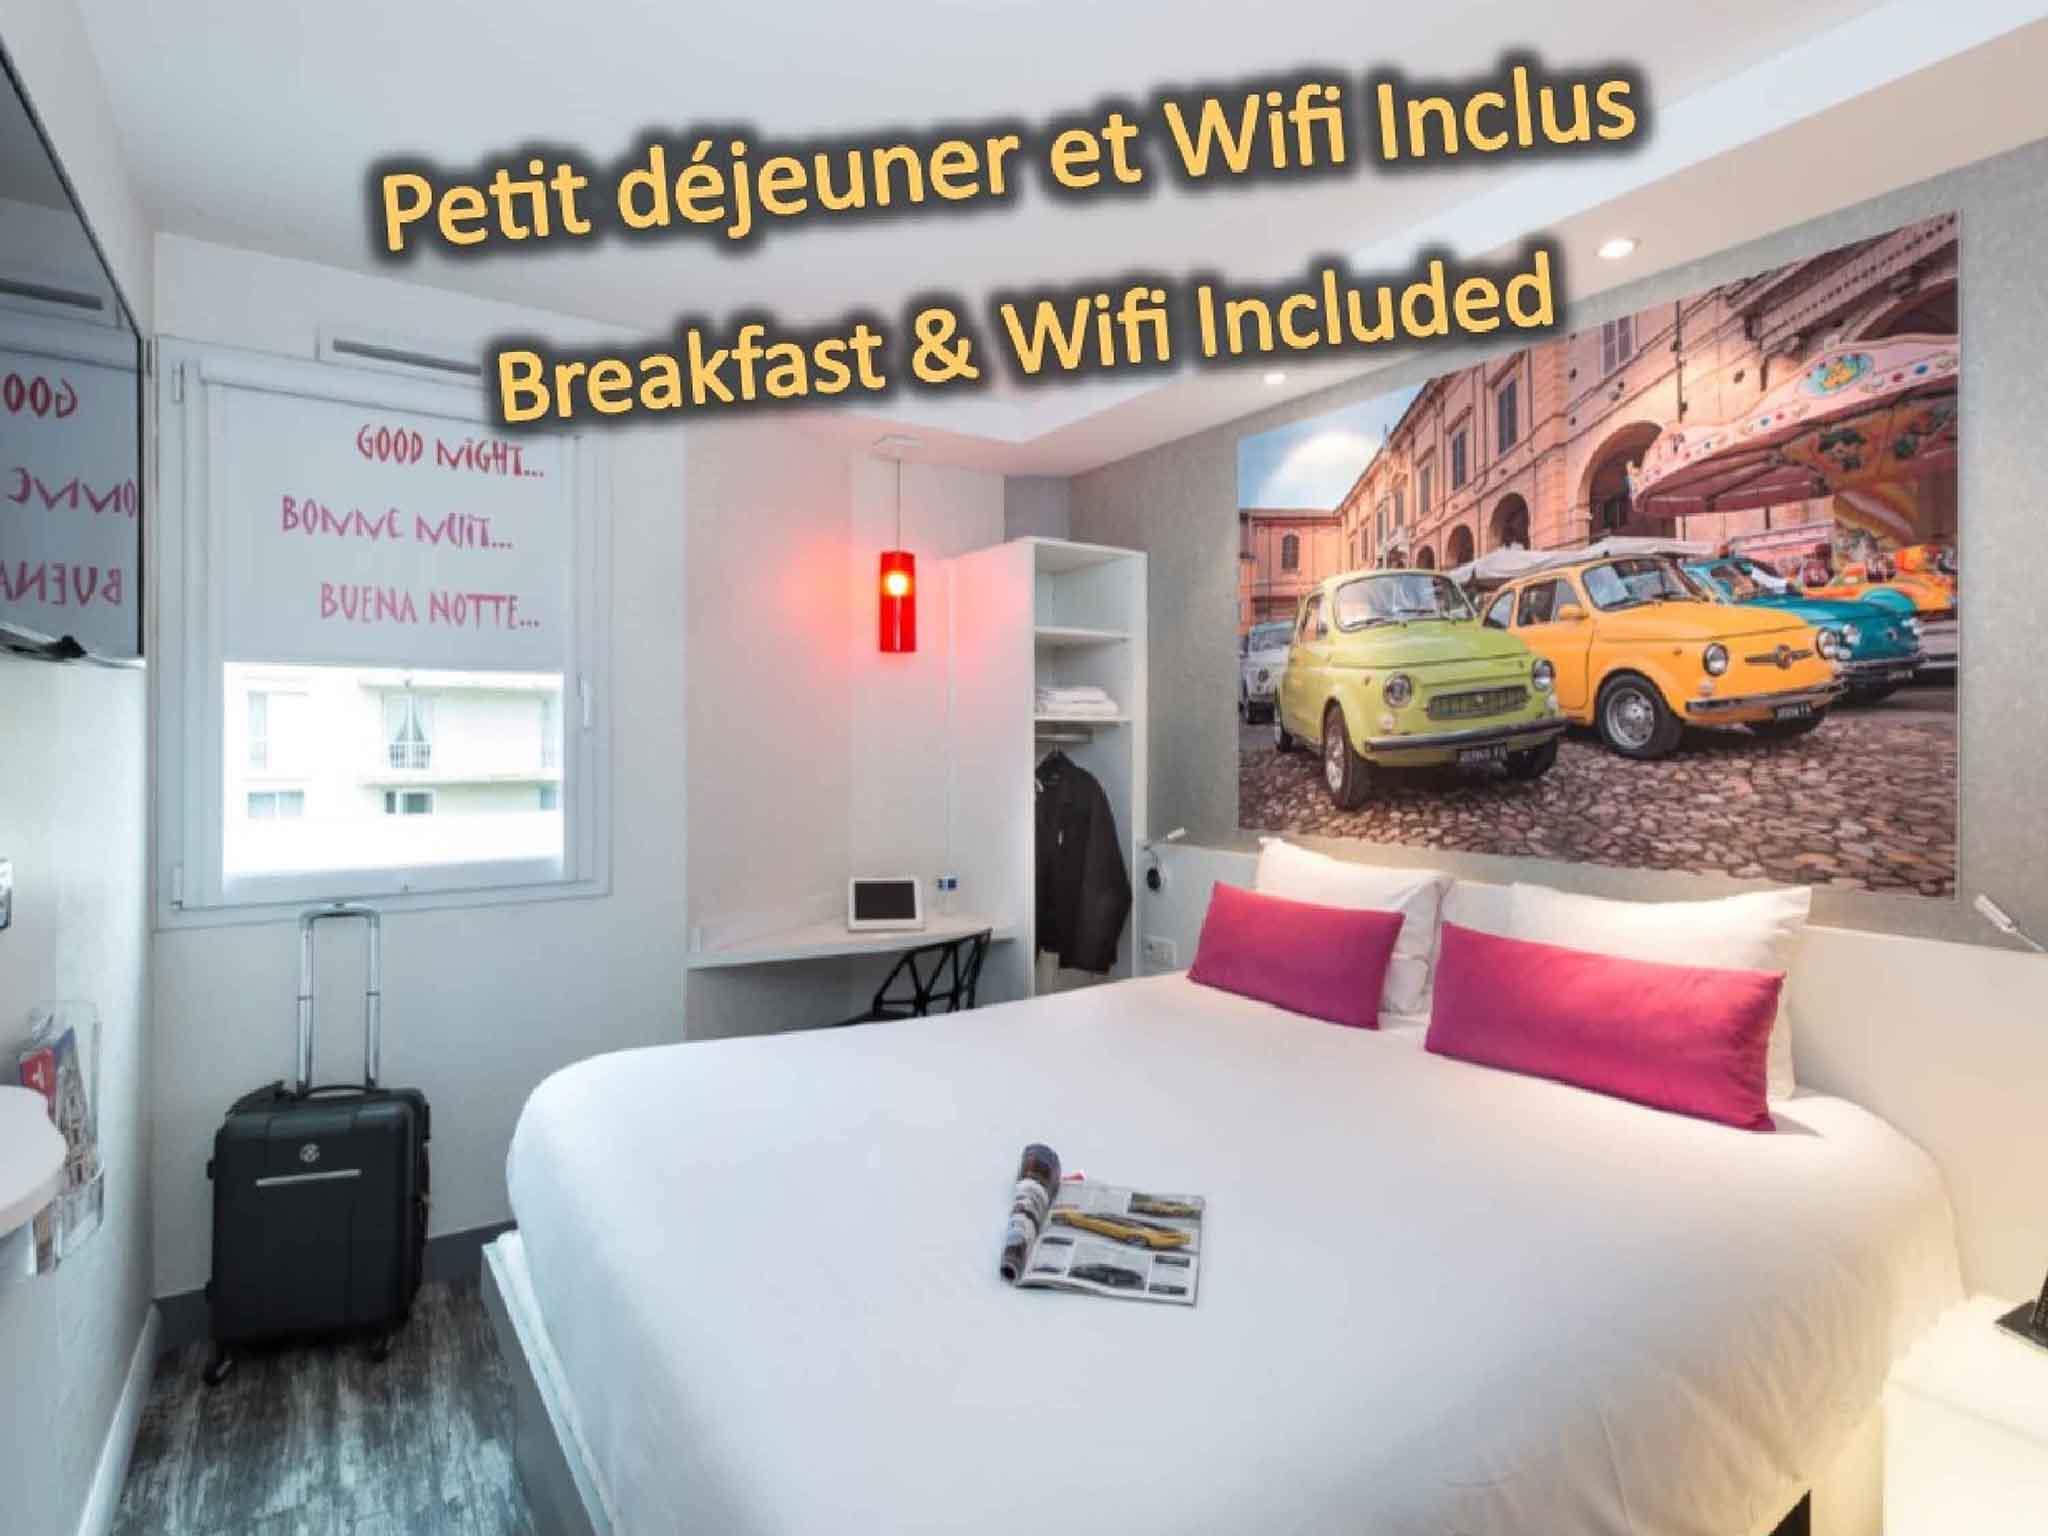 Hotel in BLOIS ibis Styles Blois Centre Gare